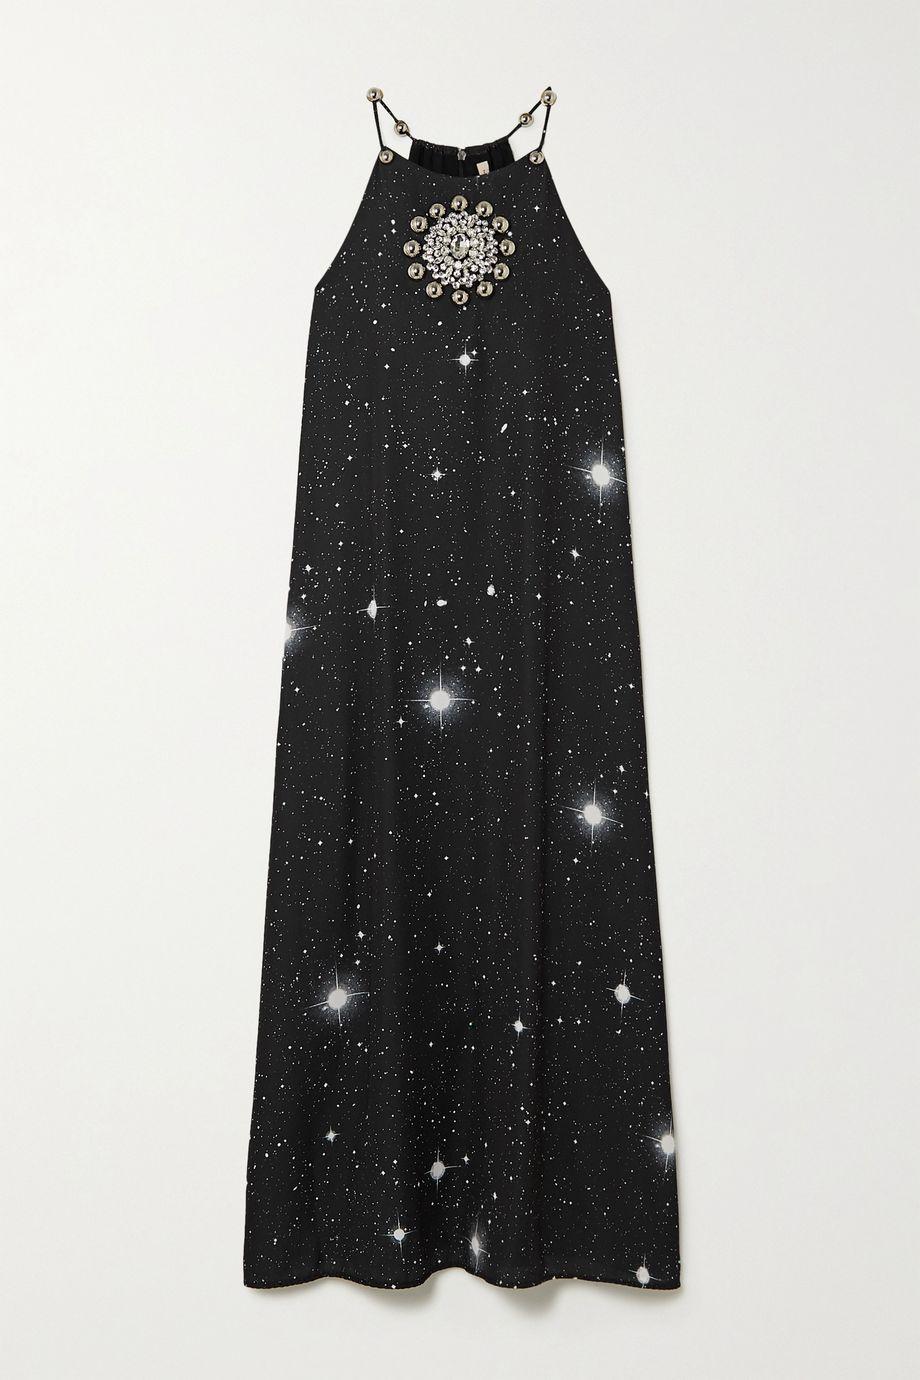 Christopher Kane Embellished printed crepe midi dress